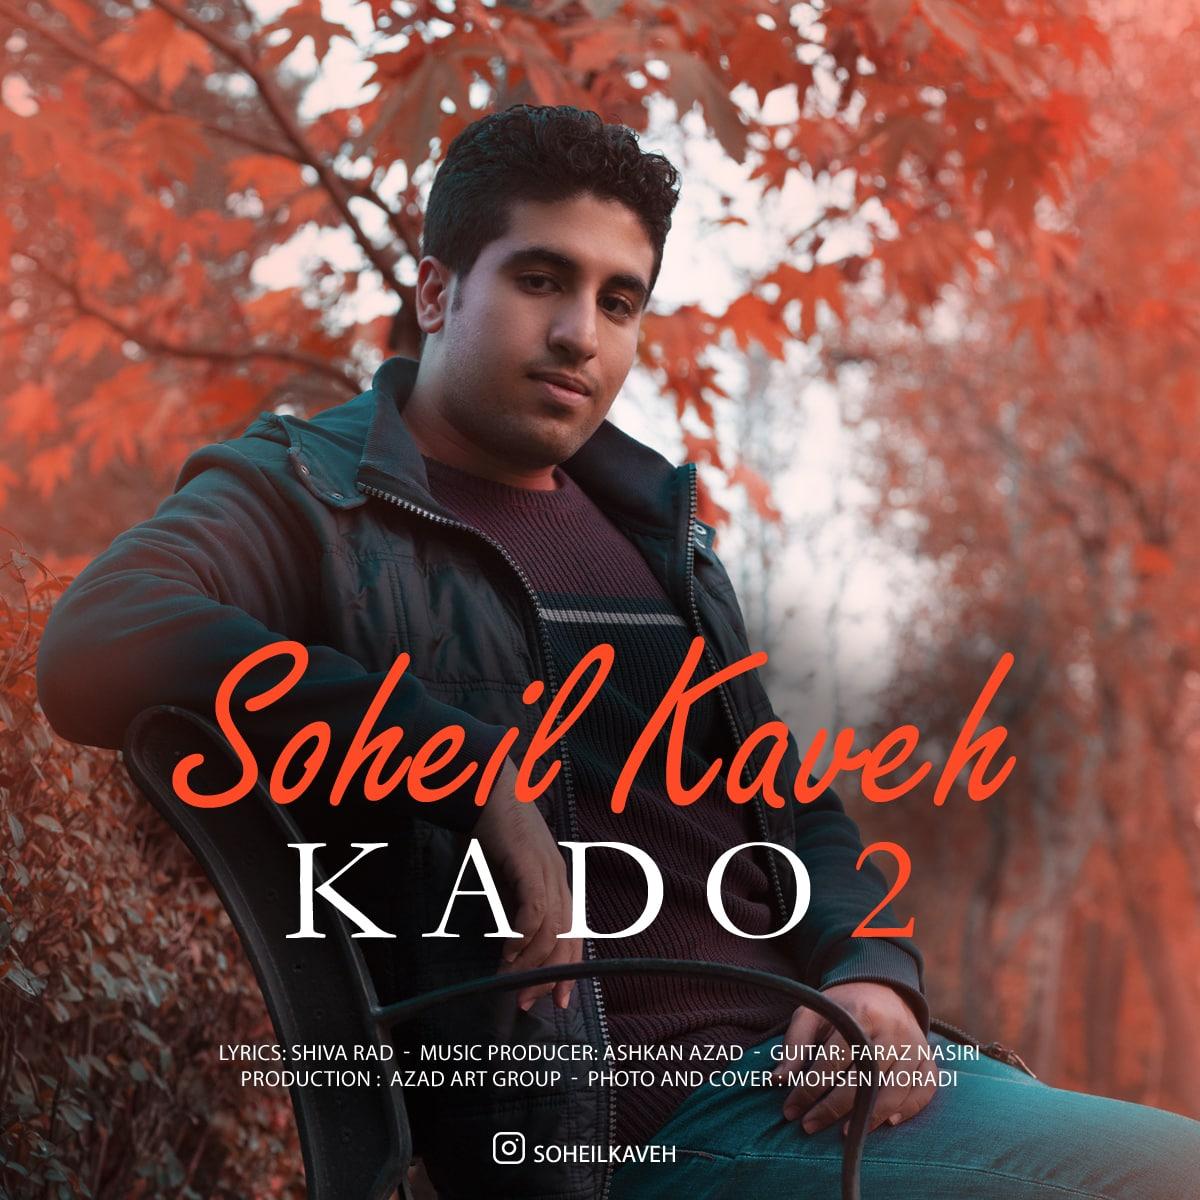 Soheil Kaveh – Kado 2